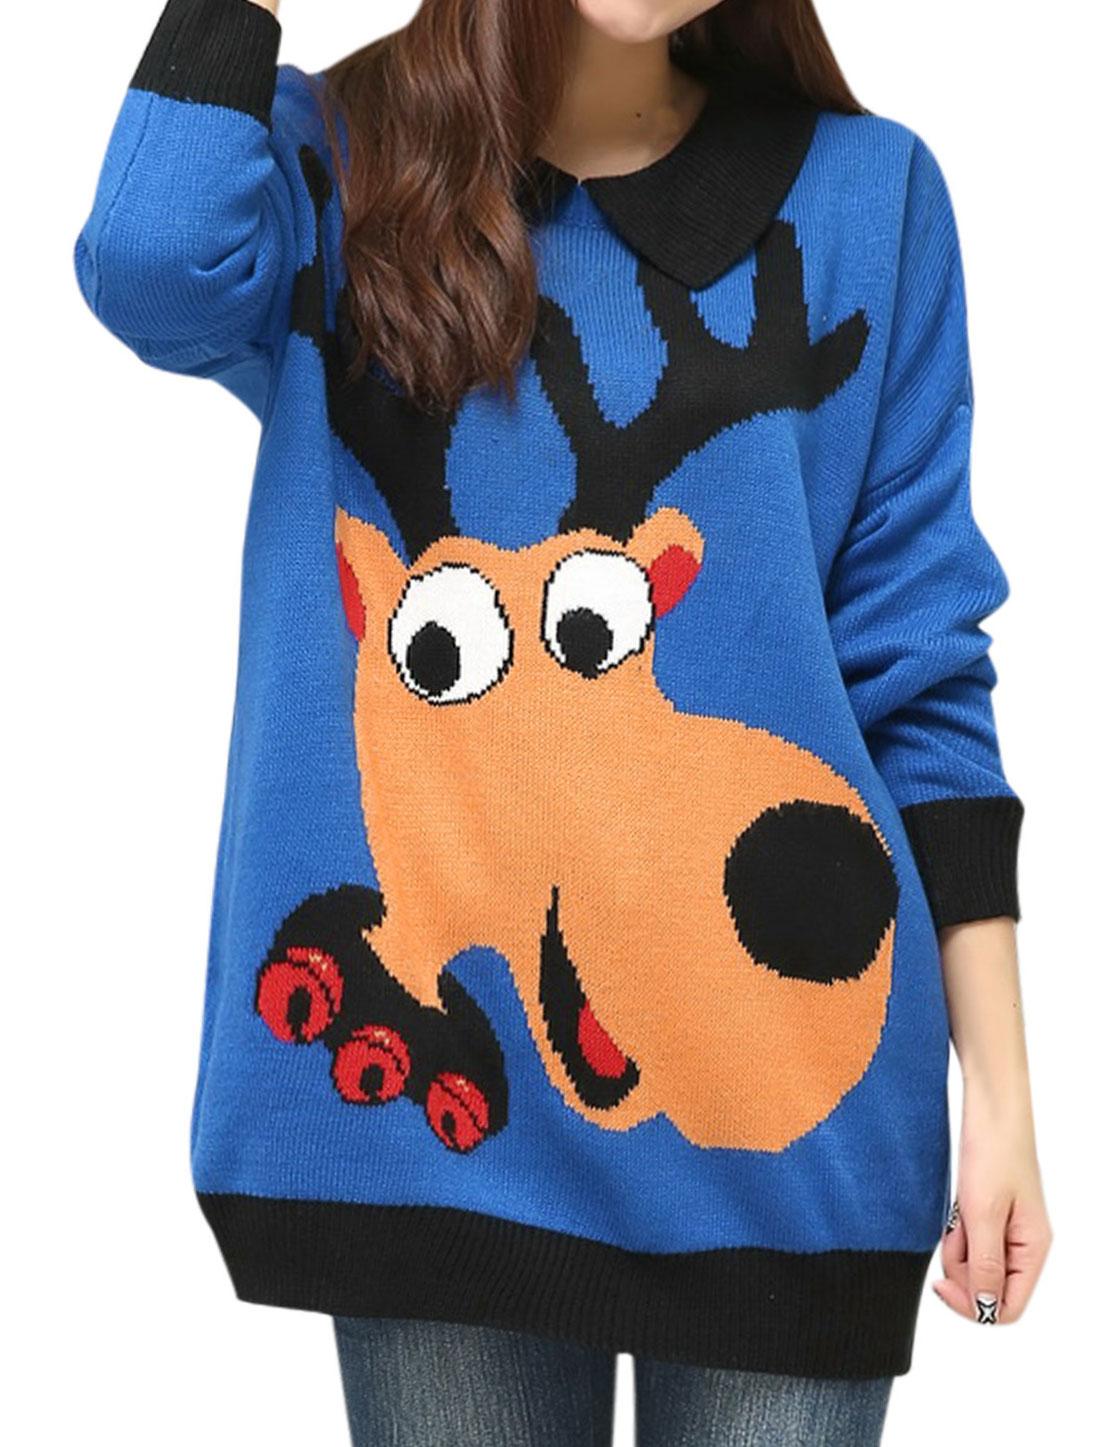 Lady Peter Pan Collar Deer Pattern Loose Fit Sweater Royal Blue XS